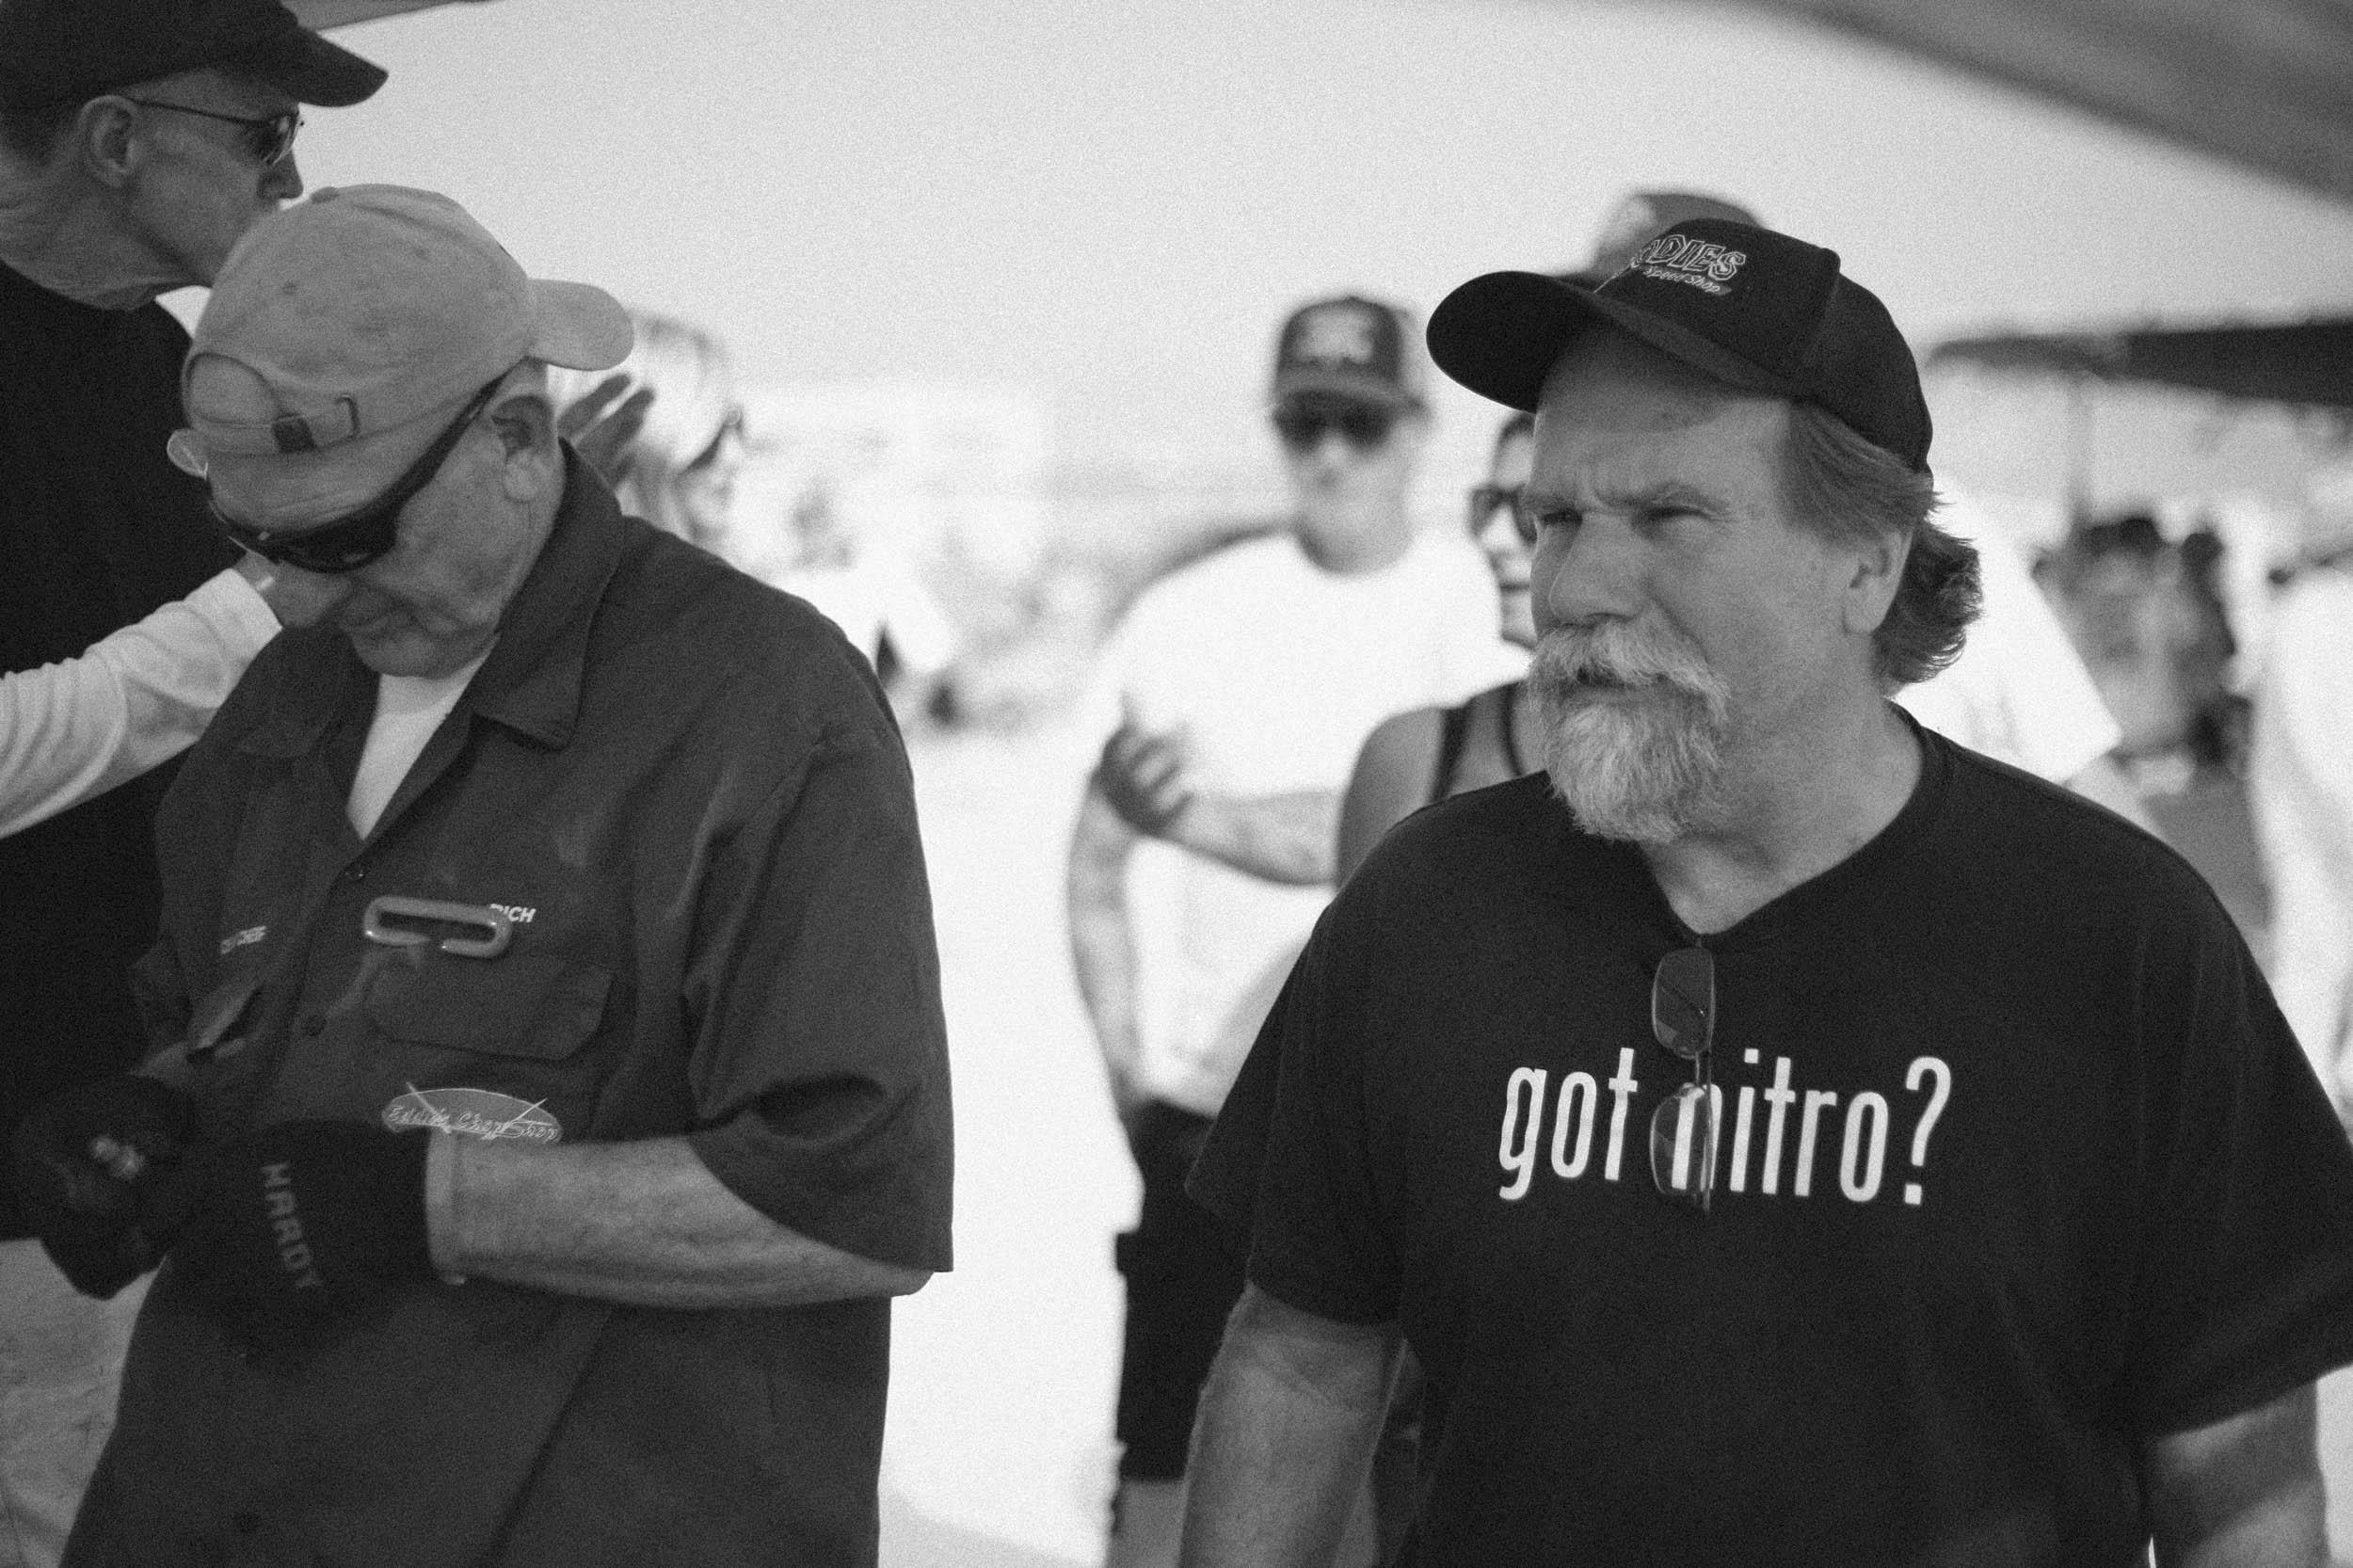 Bob Dalton checks in on fellow racer Eddie Umland as the tech inspectors validate his engine displacement